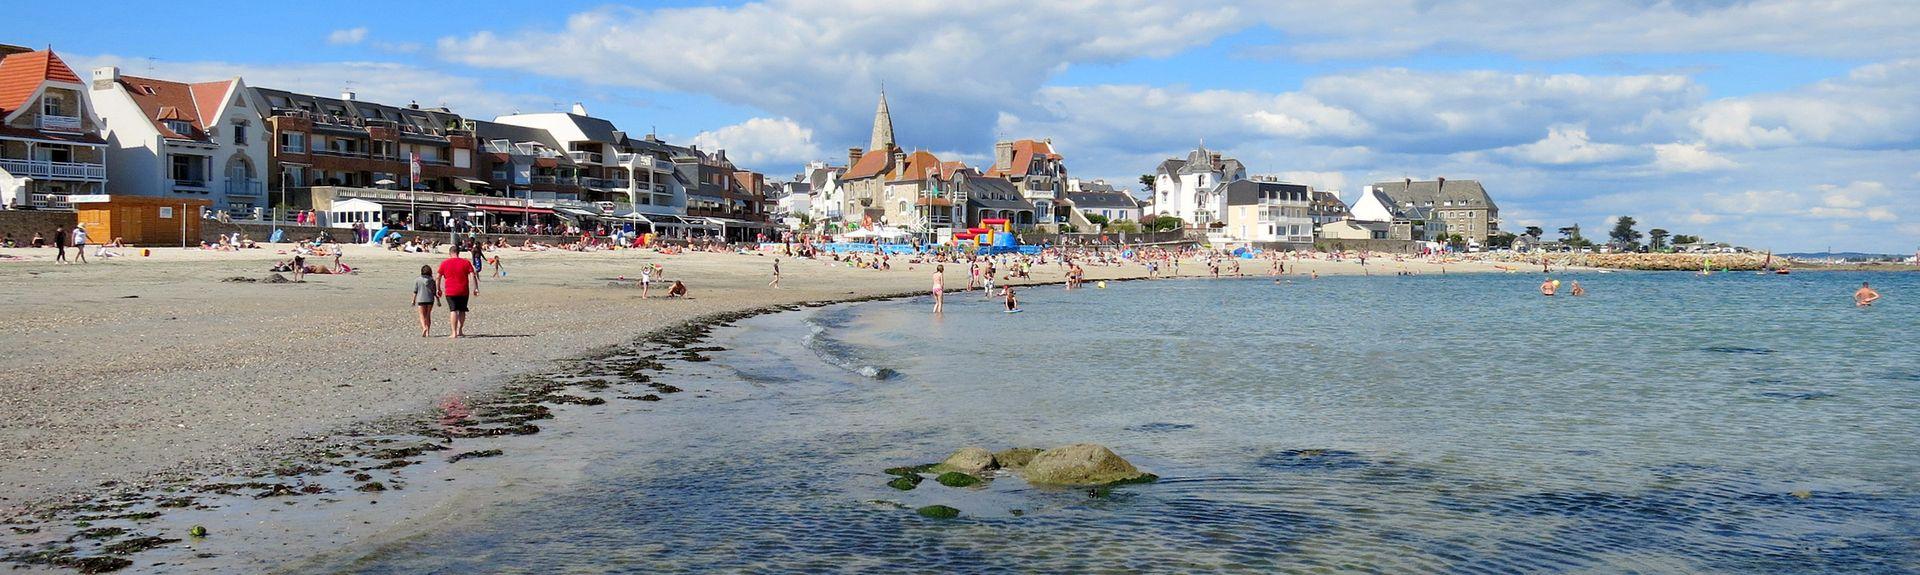 Larmor-Plage, Morbihan, France